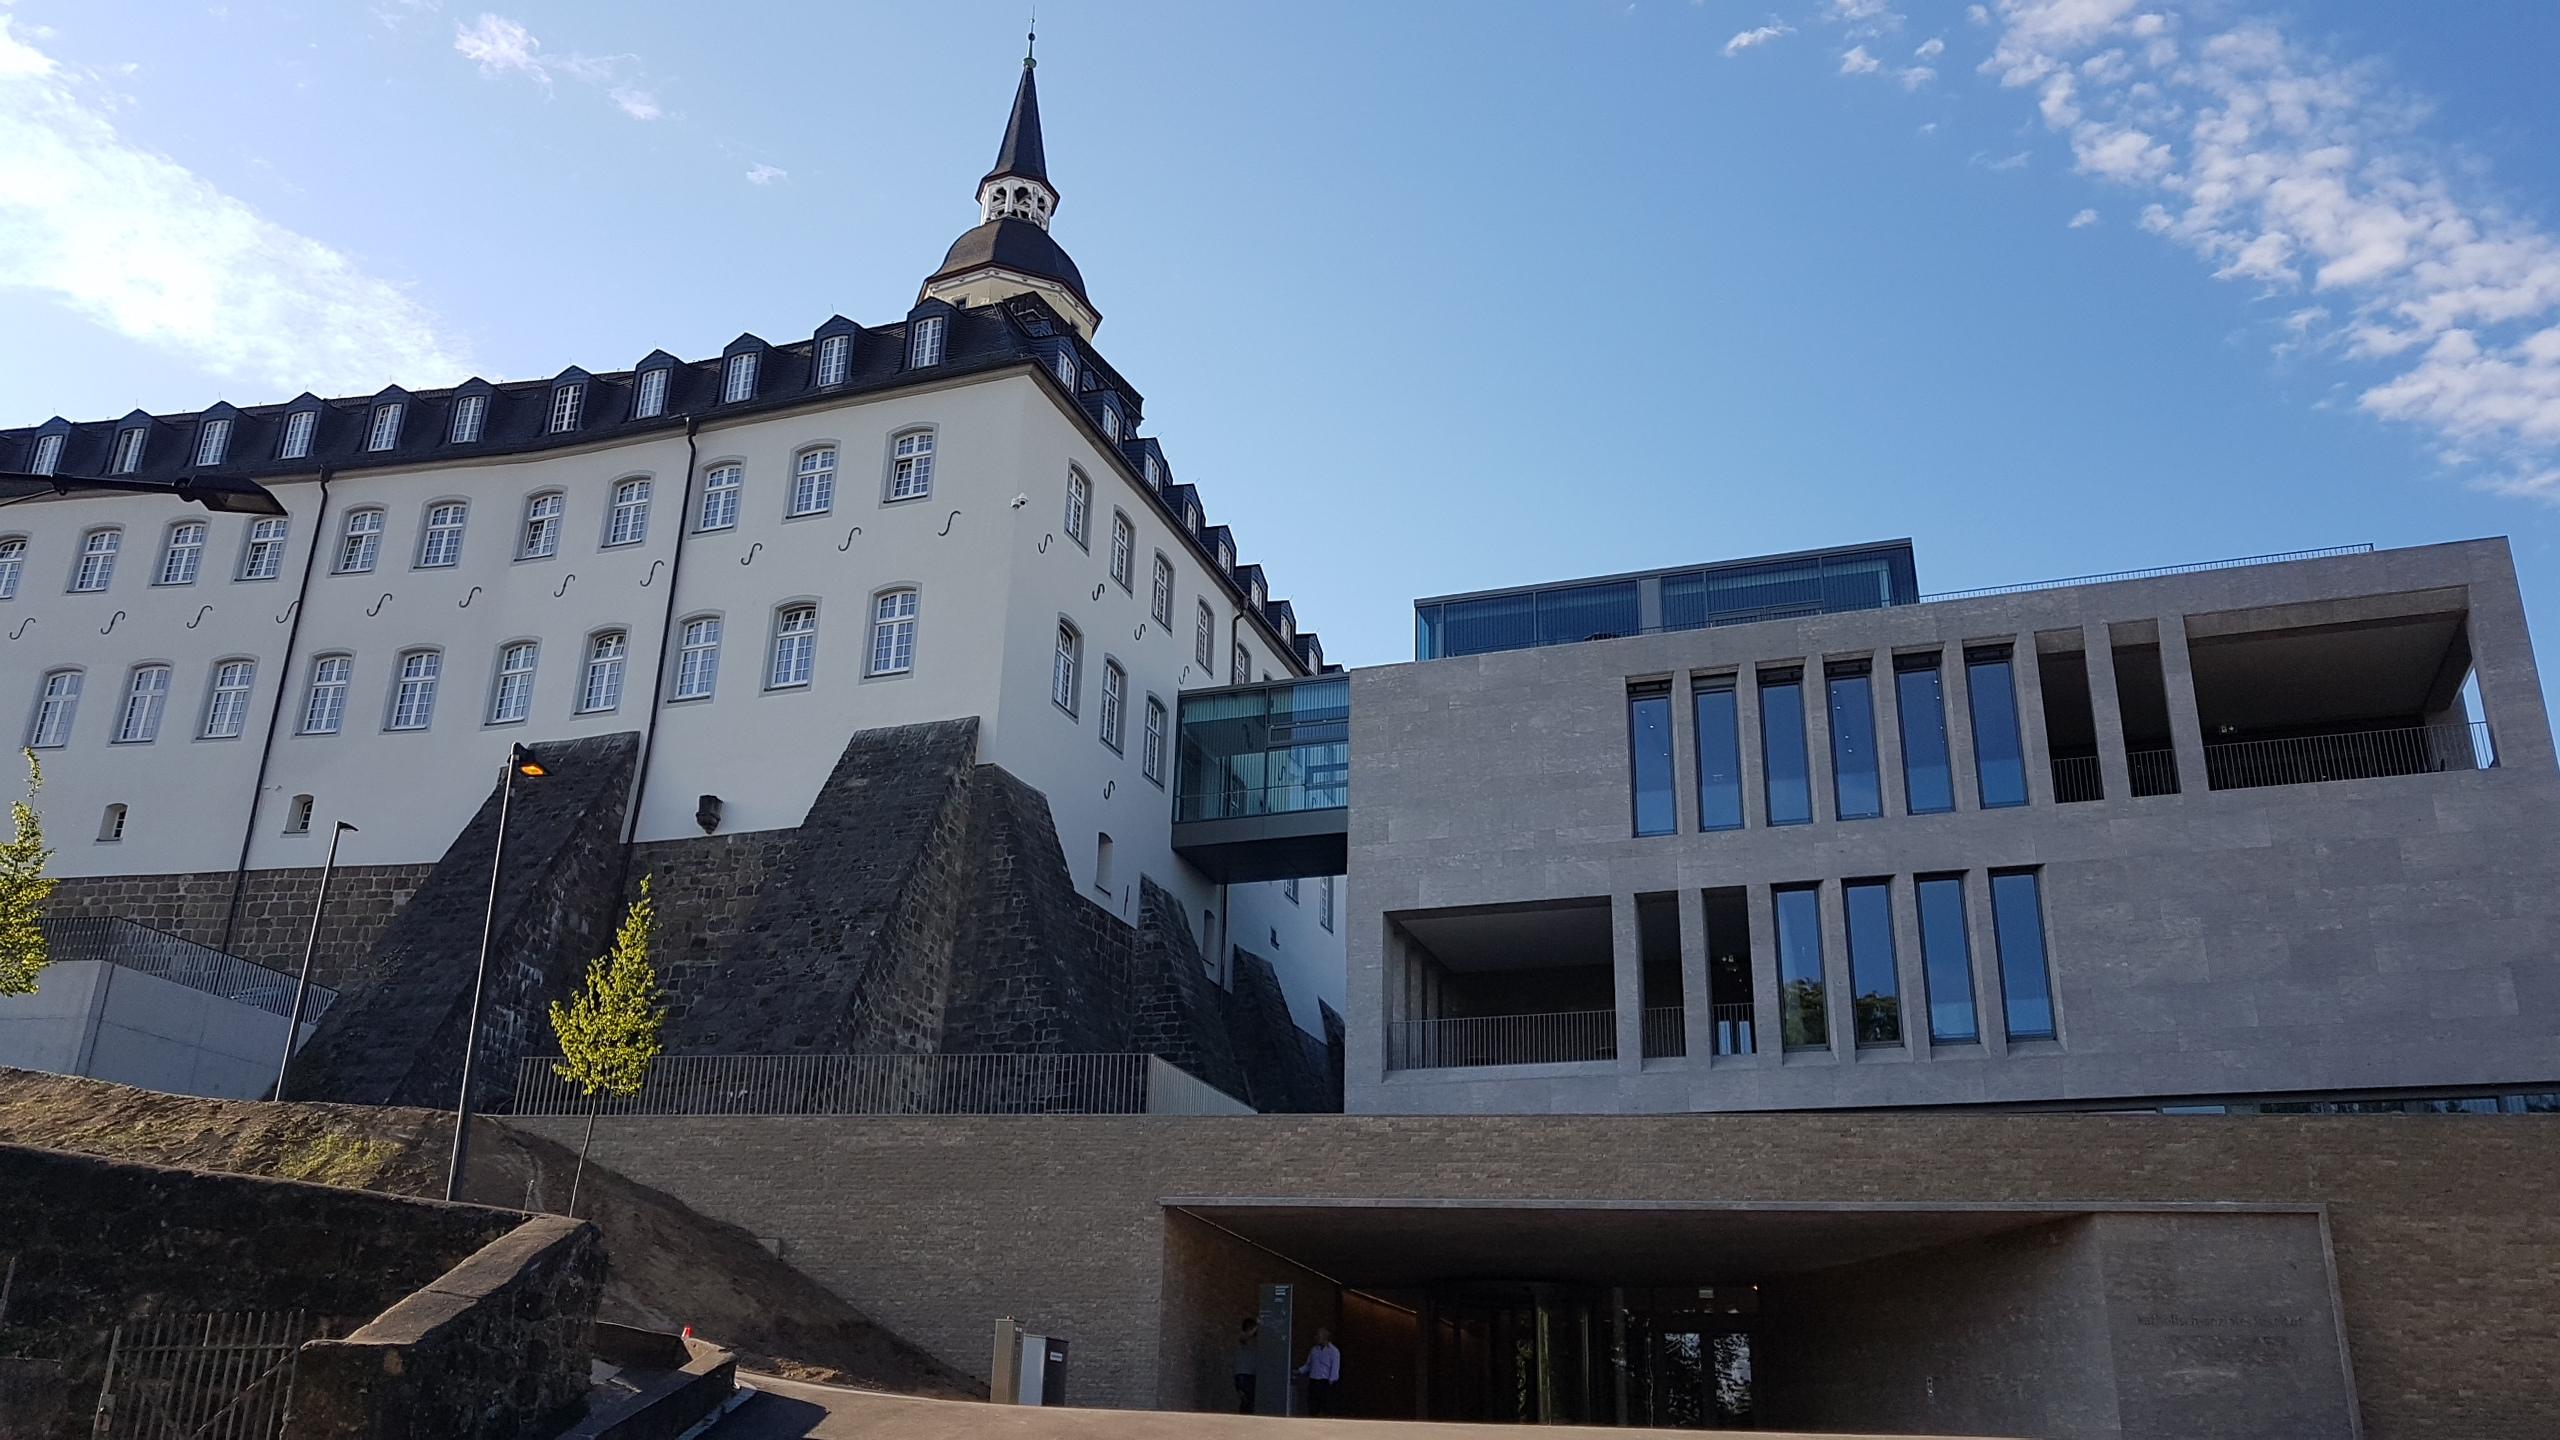 Katholisch-Soziales Institut Bad Honnef